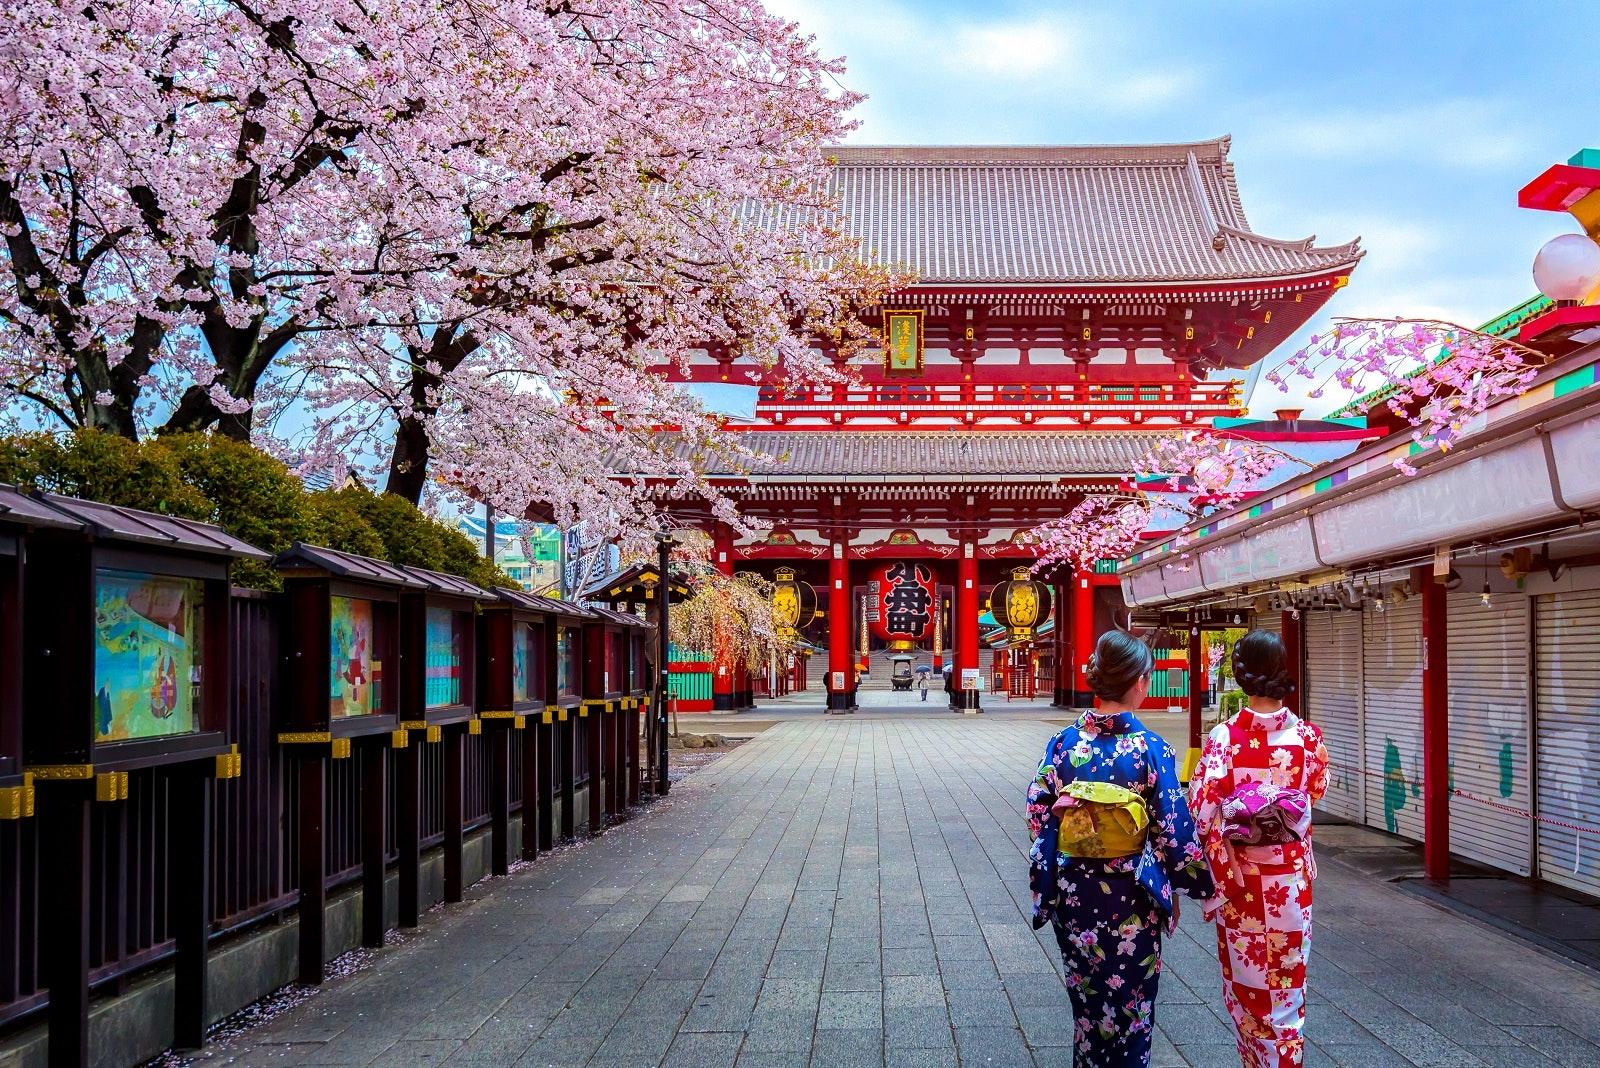 Sensō-ji temple in Asakusa, Tokyo, Japan © Phattana Stock / Shutterstock